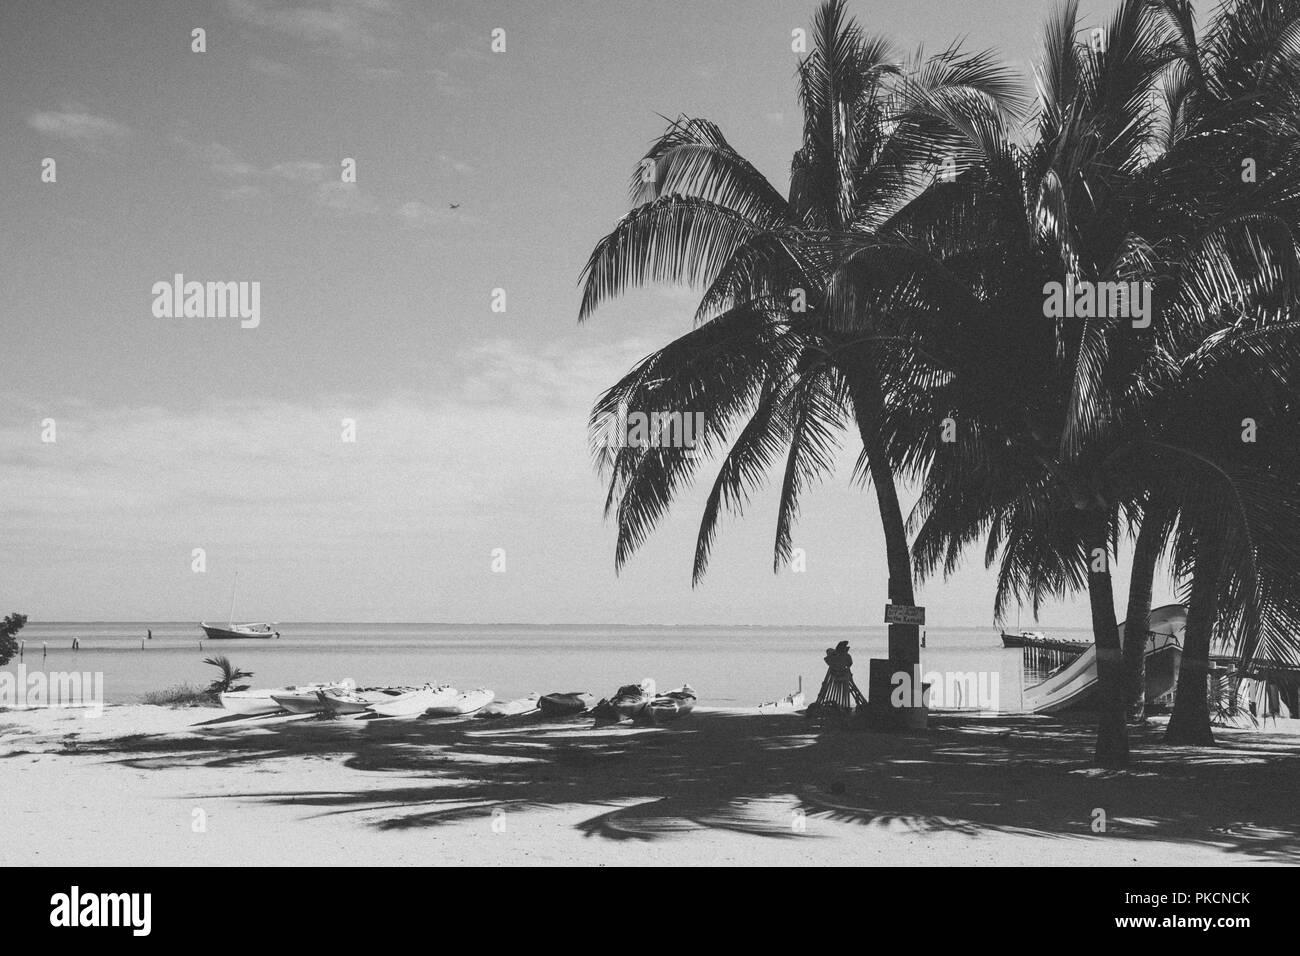 Multicoloured Rental Sea Kayaks on Tropical Beach on a Sunny Day - Stock Image